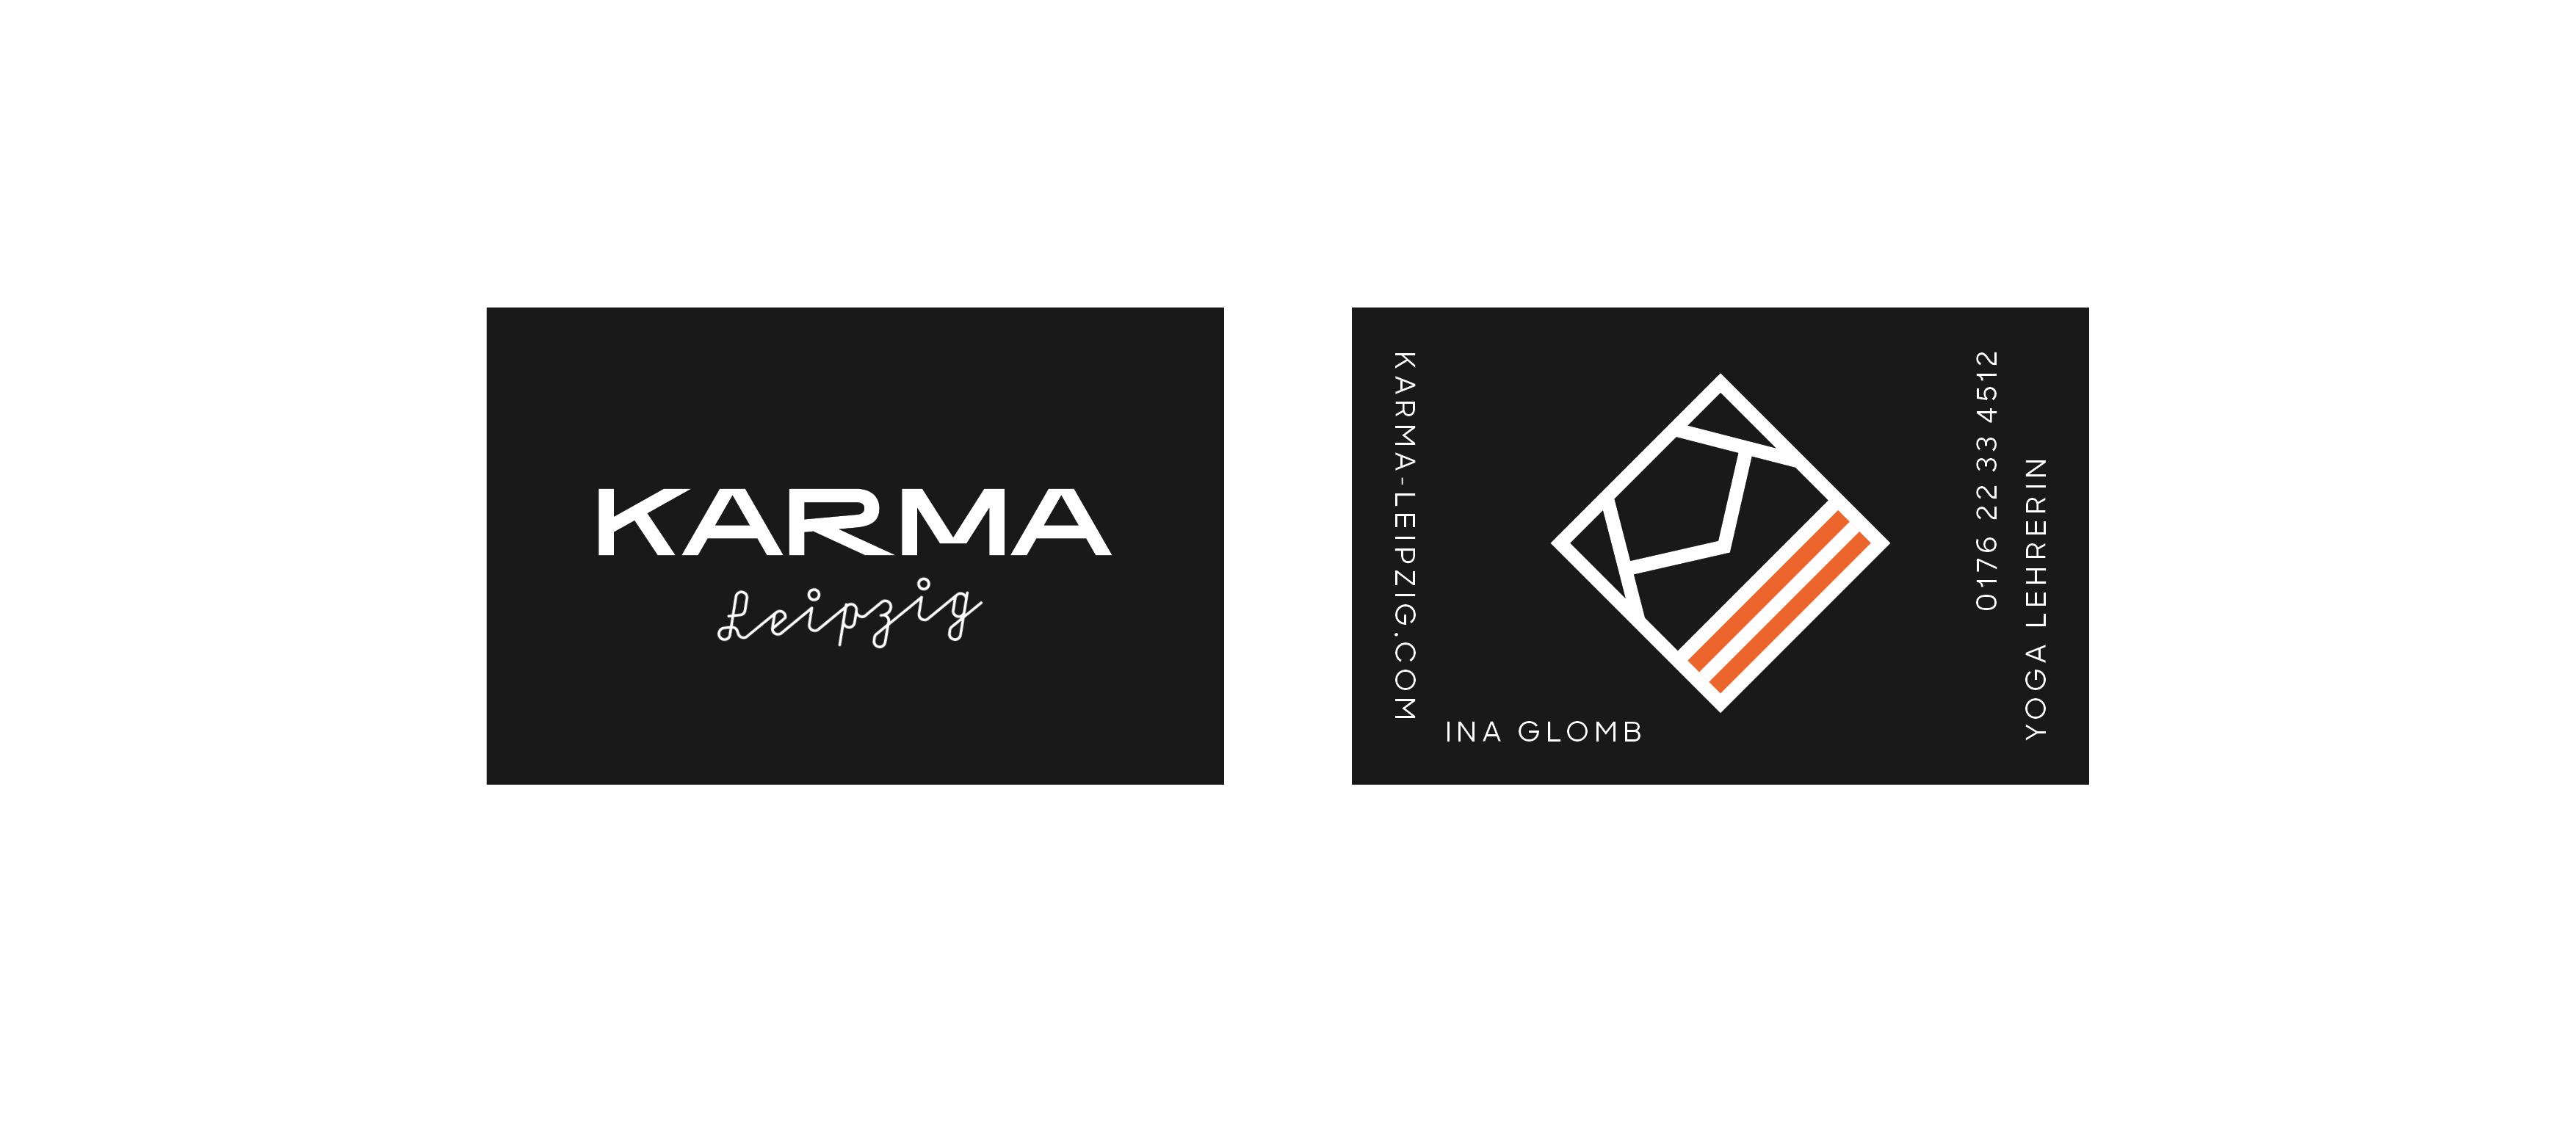 Karma Leipzig Font Variante